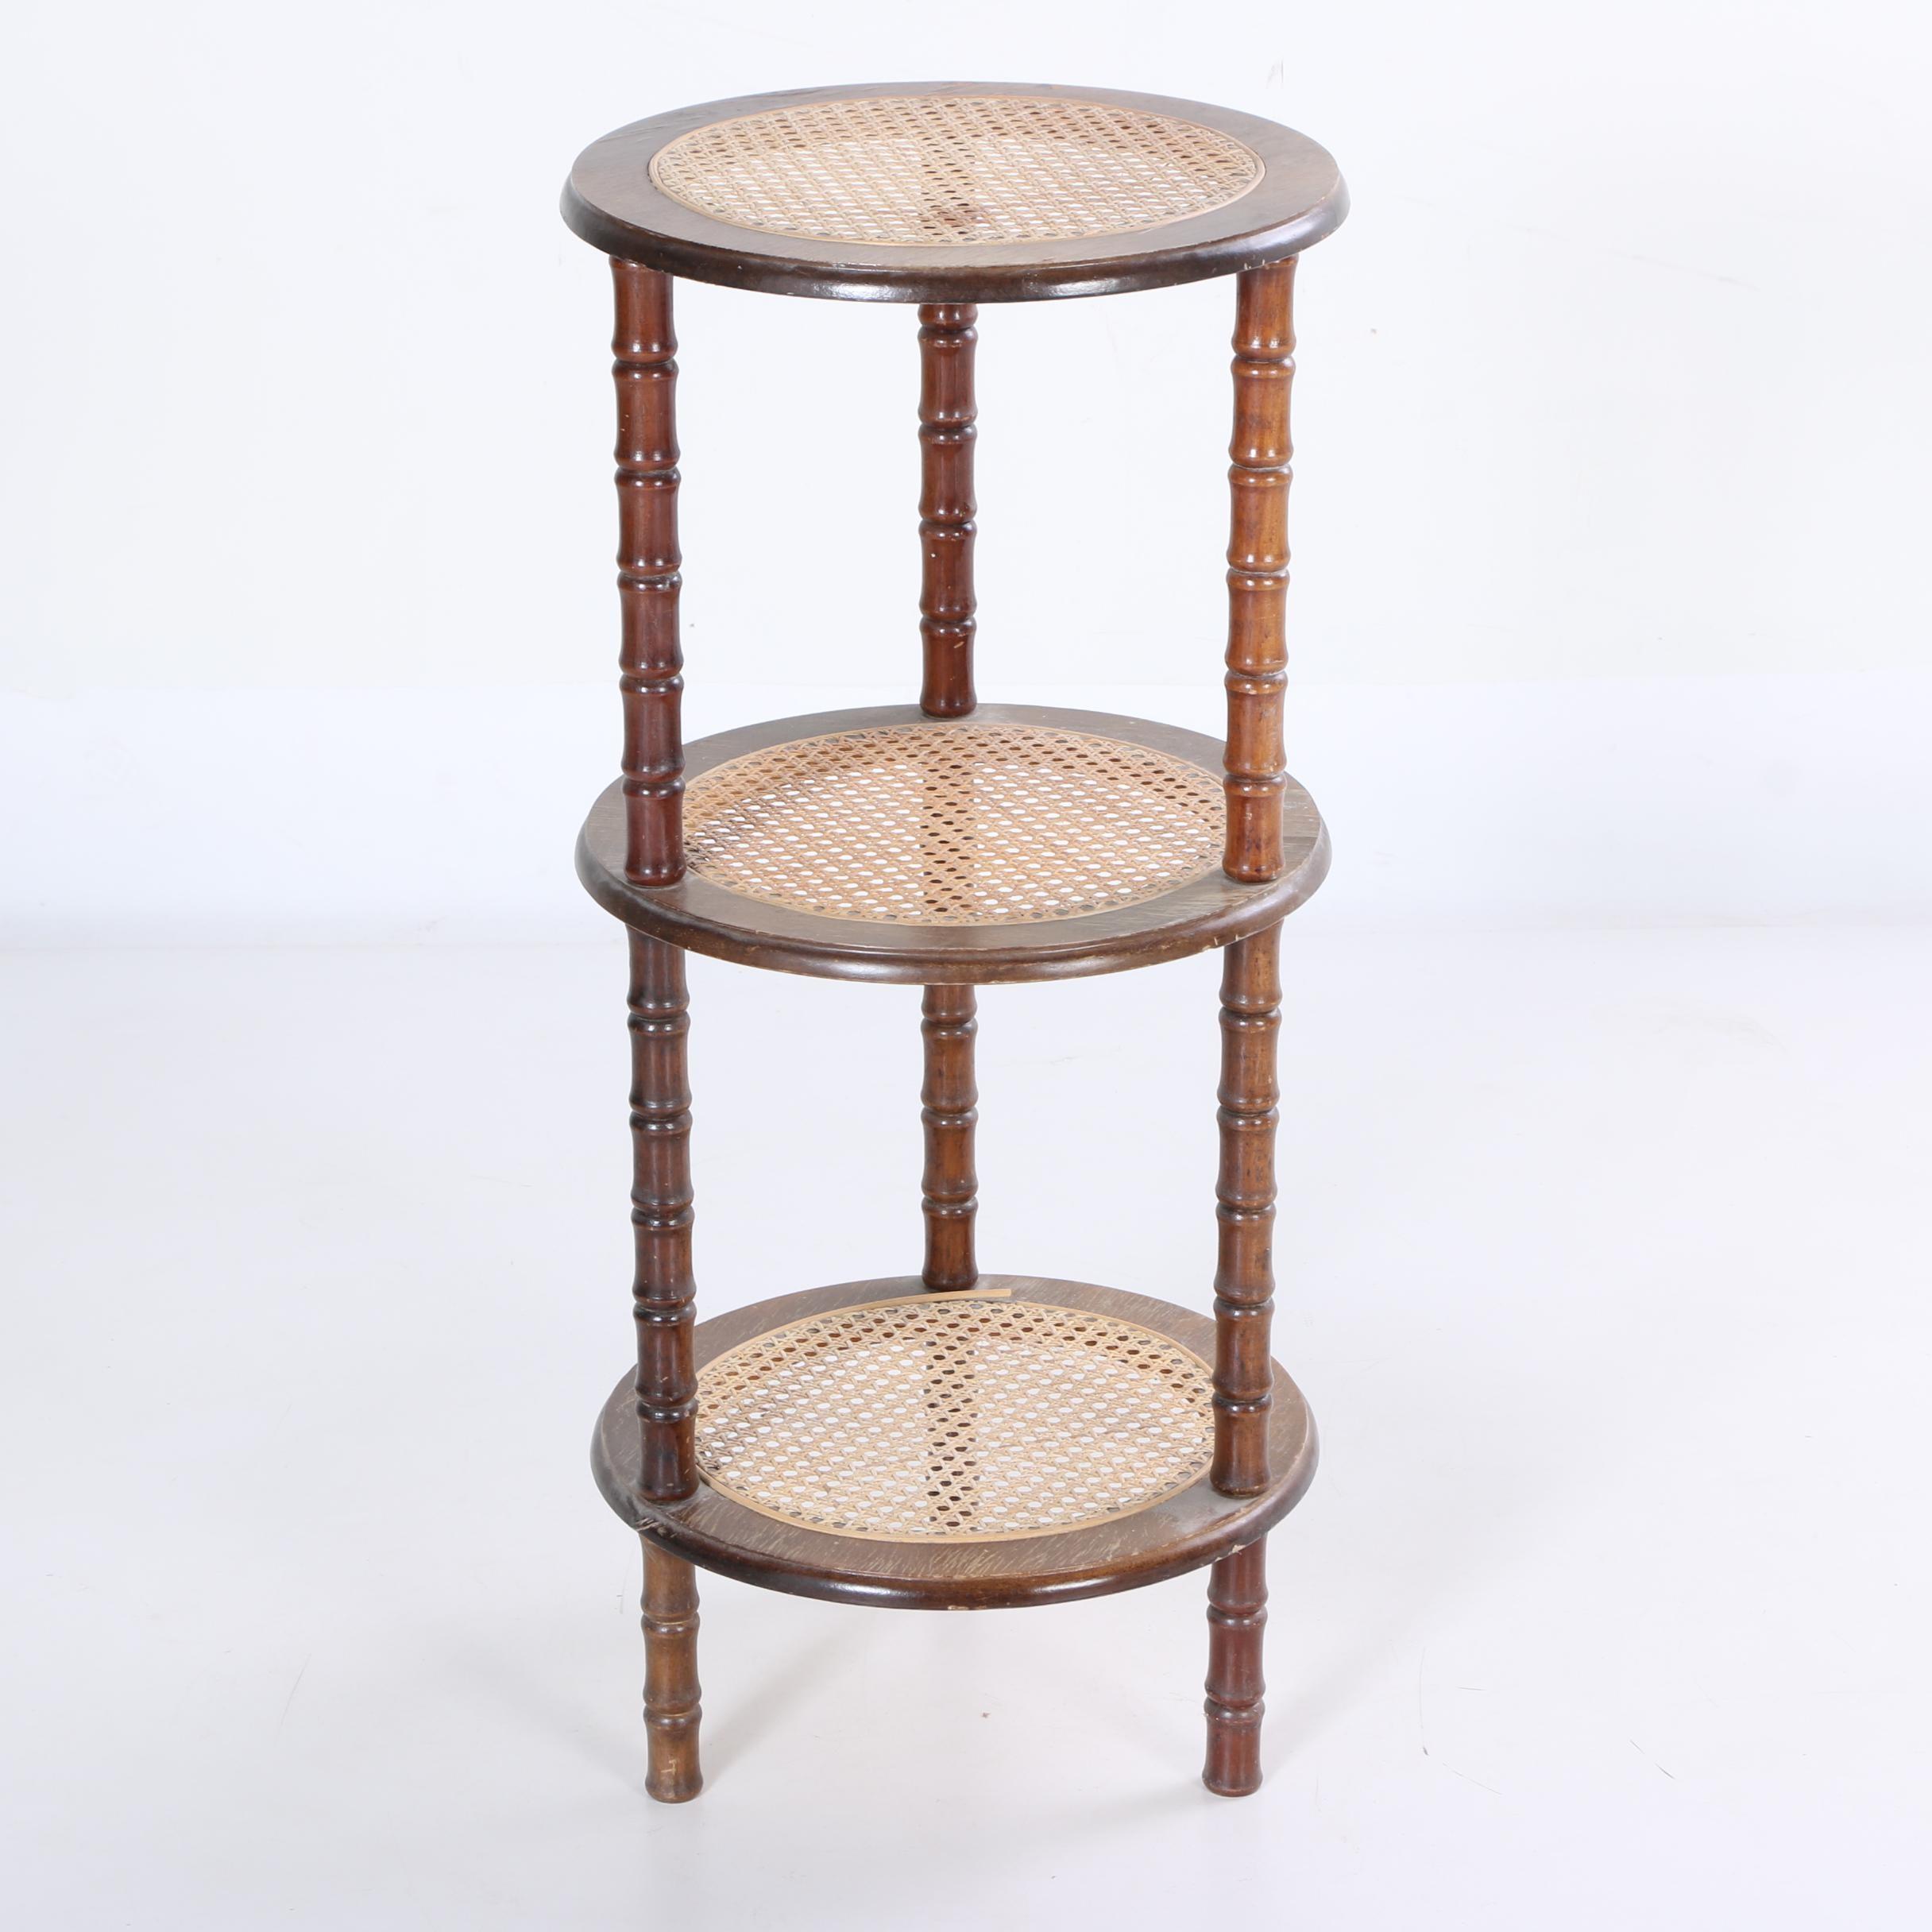 Vintage Three Tiered End Table